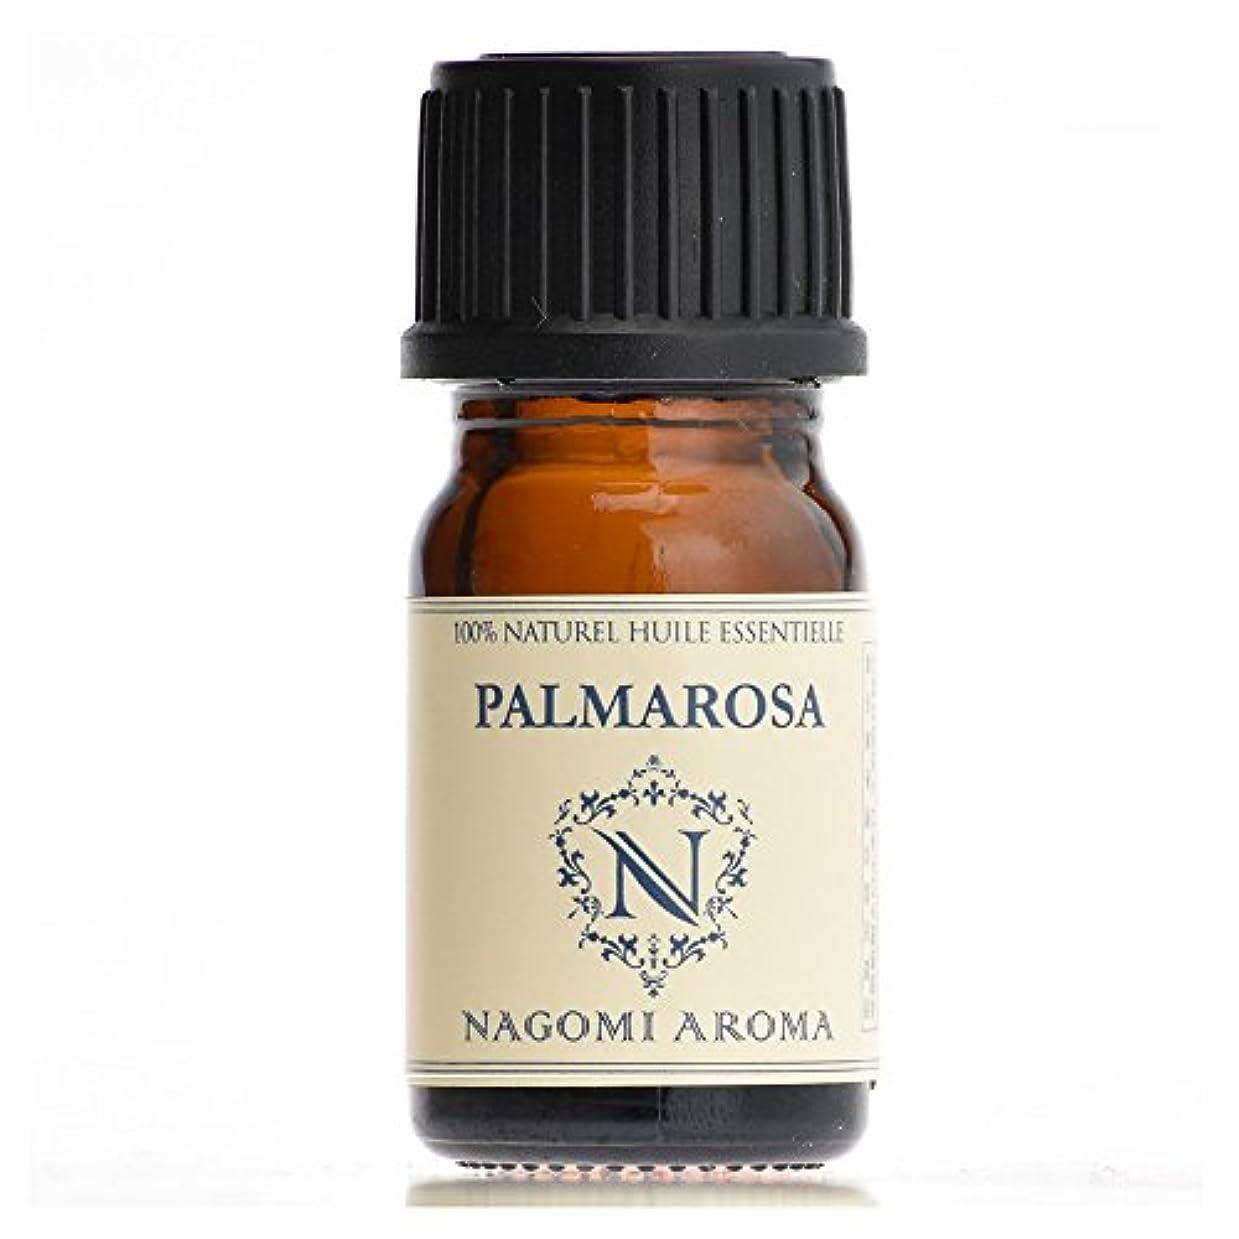 【AEAJ認定表示基準認定精油】NAGOMI PURE パルマローザ 5ml 【エッセンシャルオイル】【精油】【アロマオイル】 CONVOILs